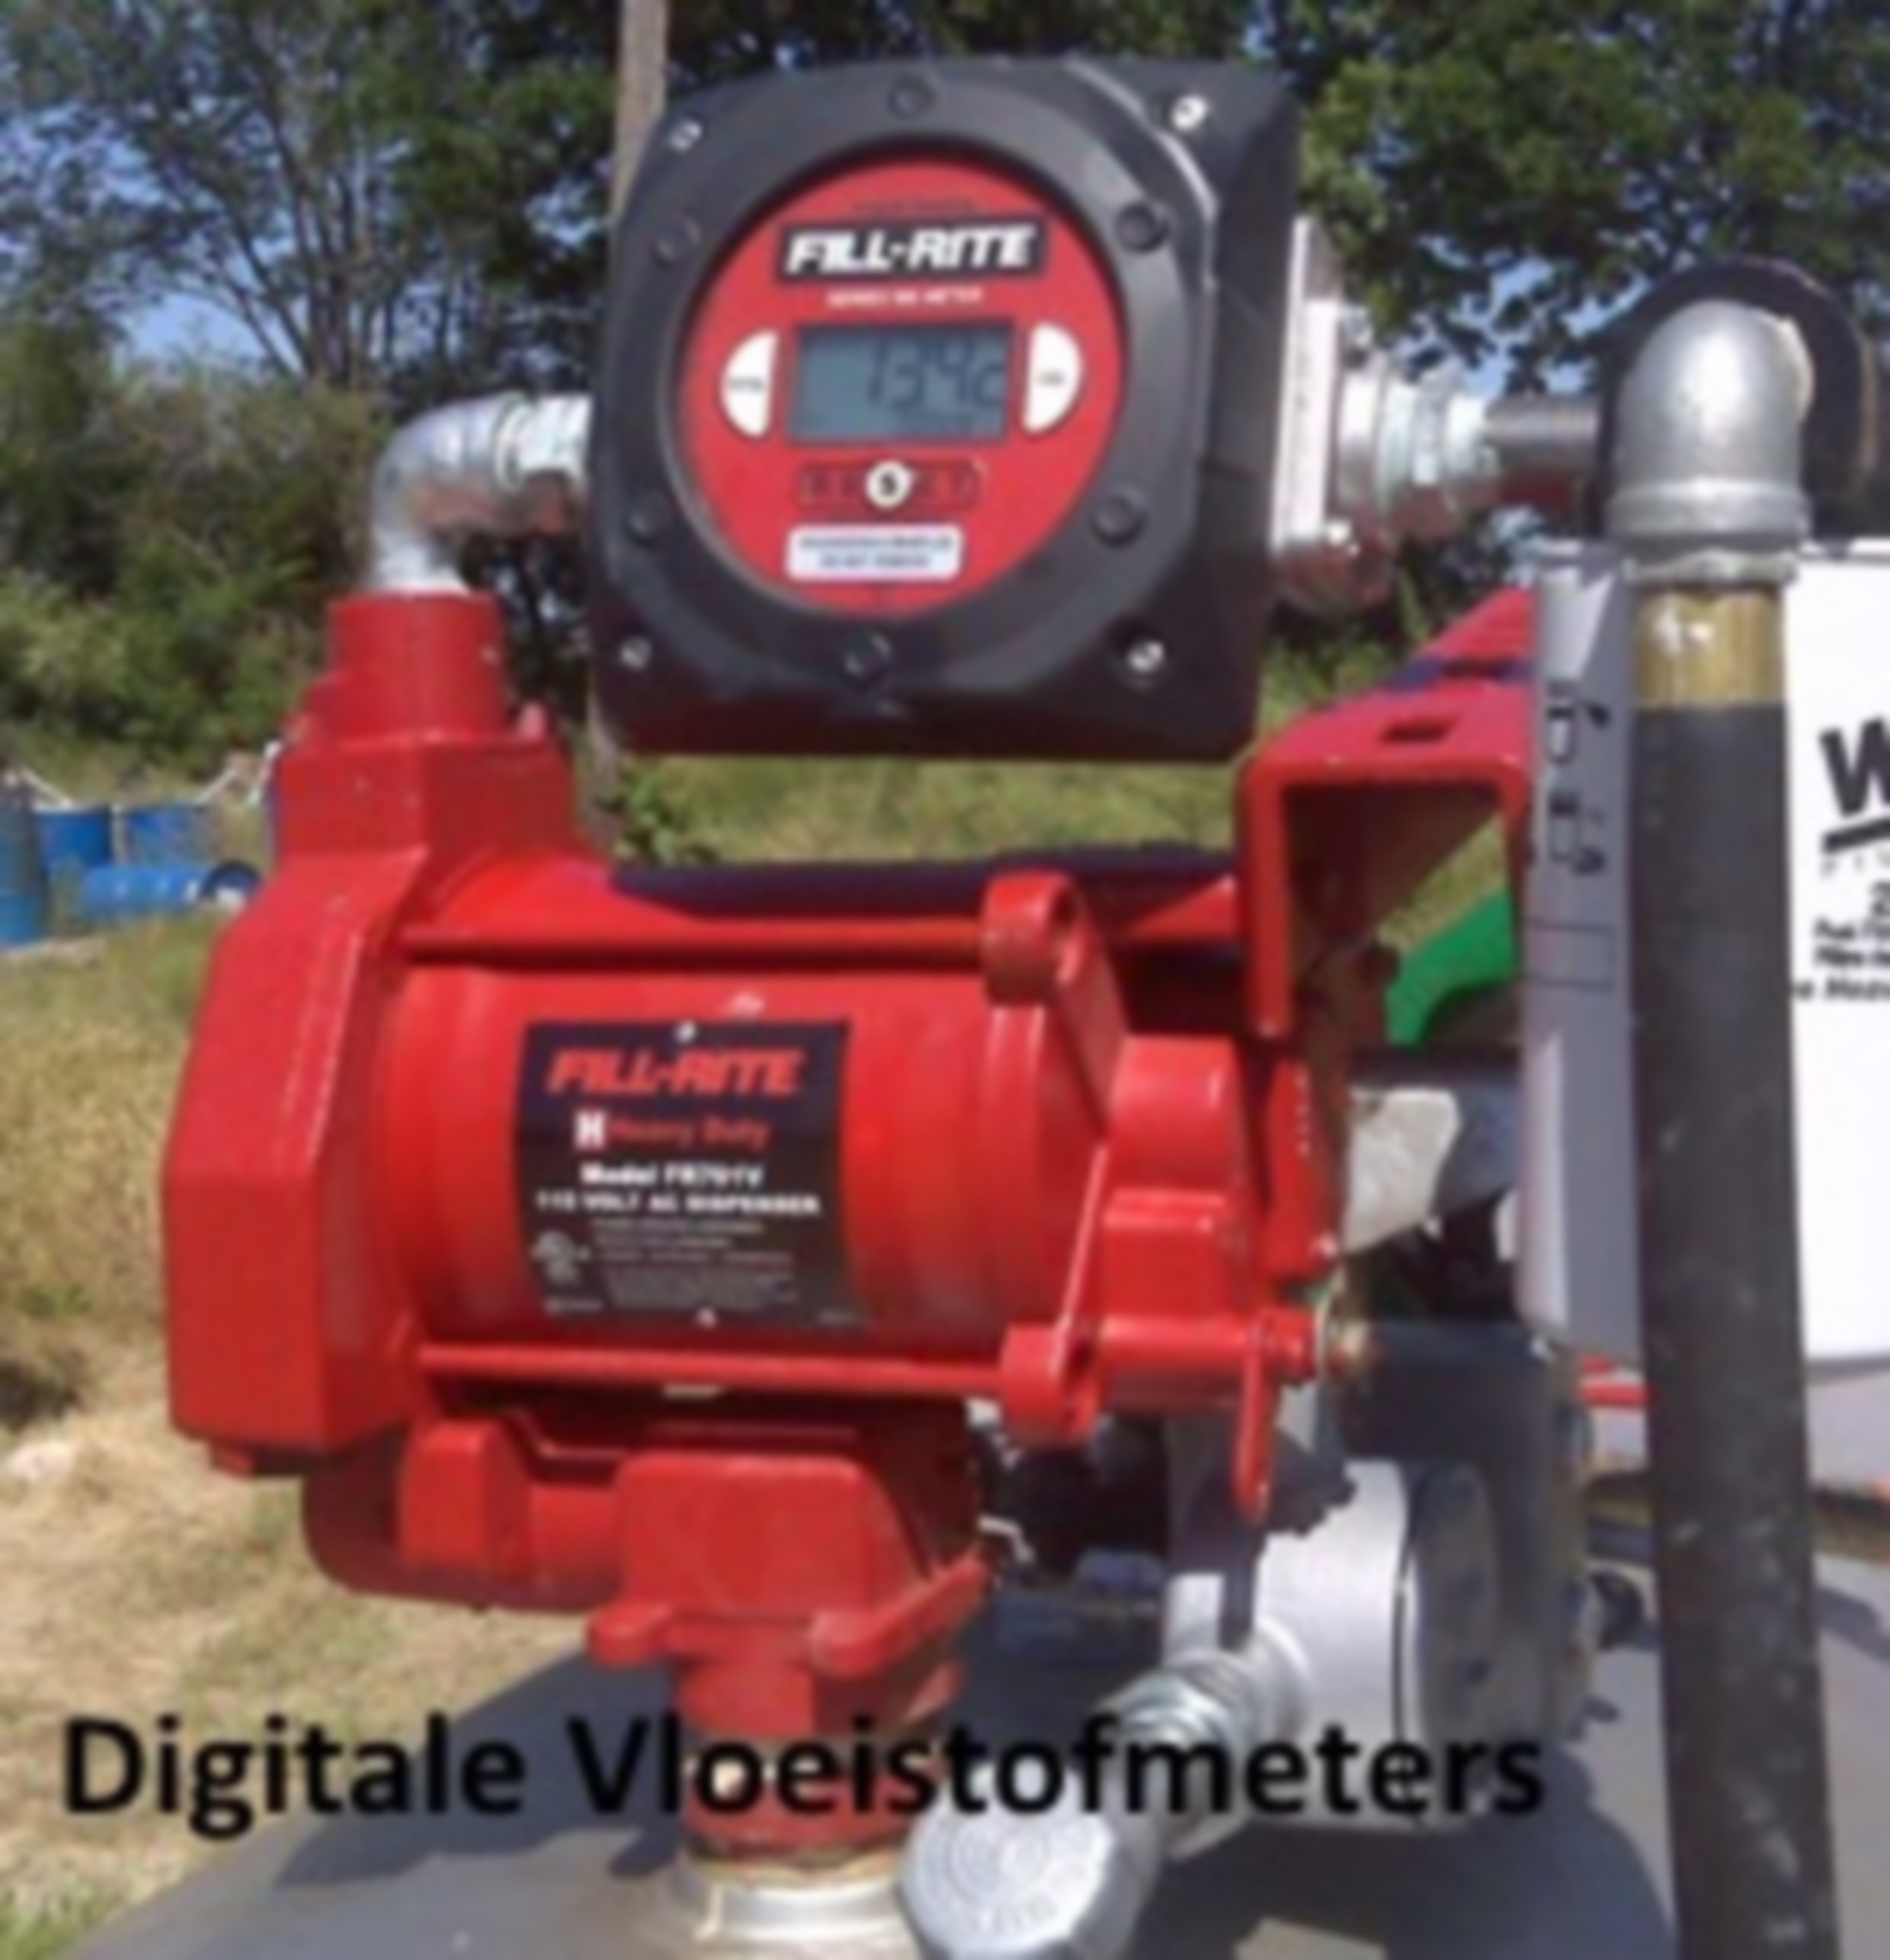 Fill-Rite Digitale meters